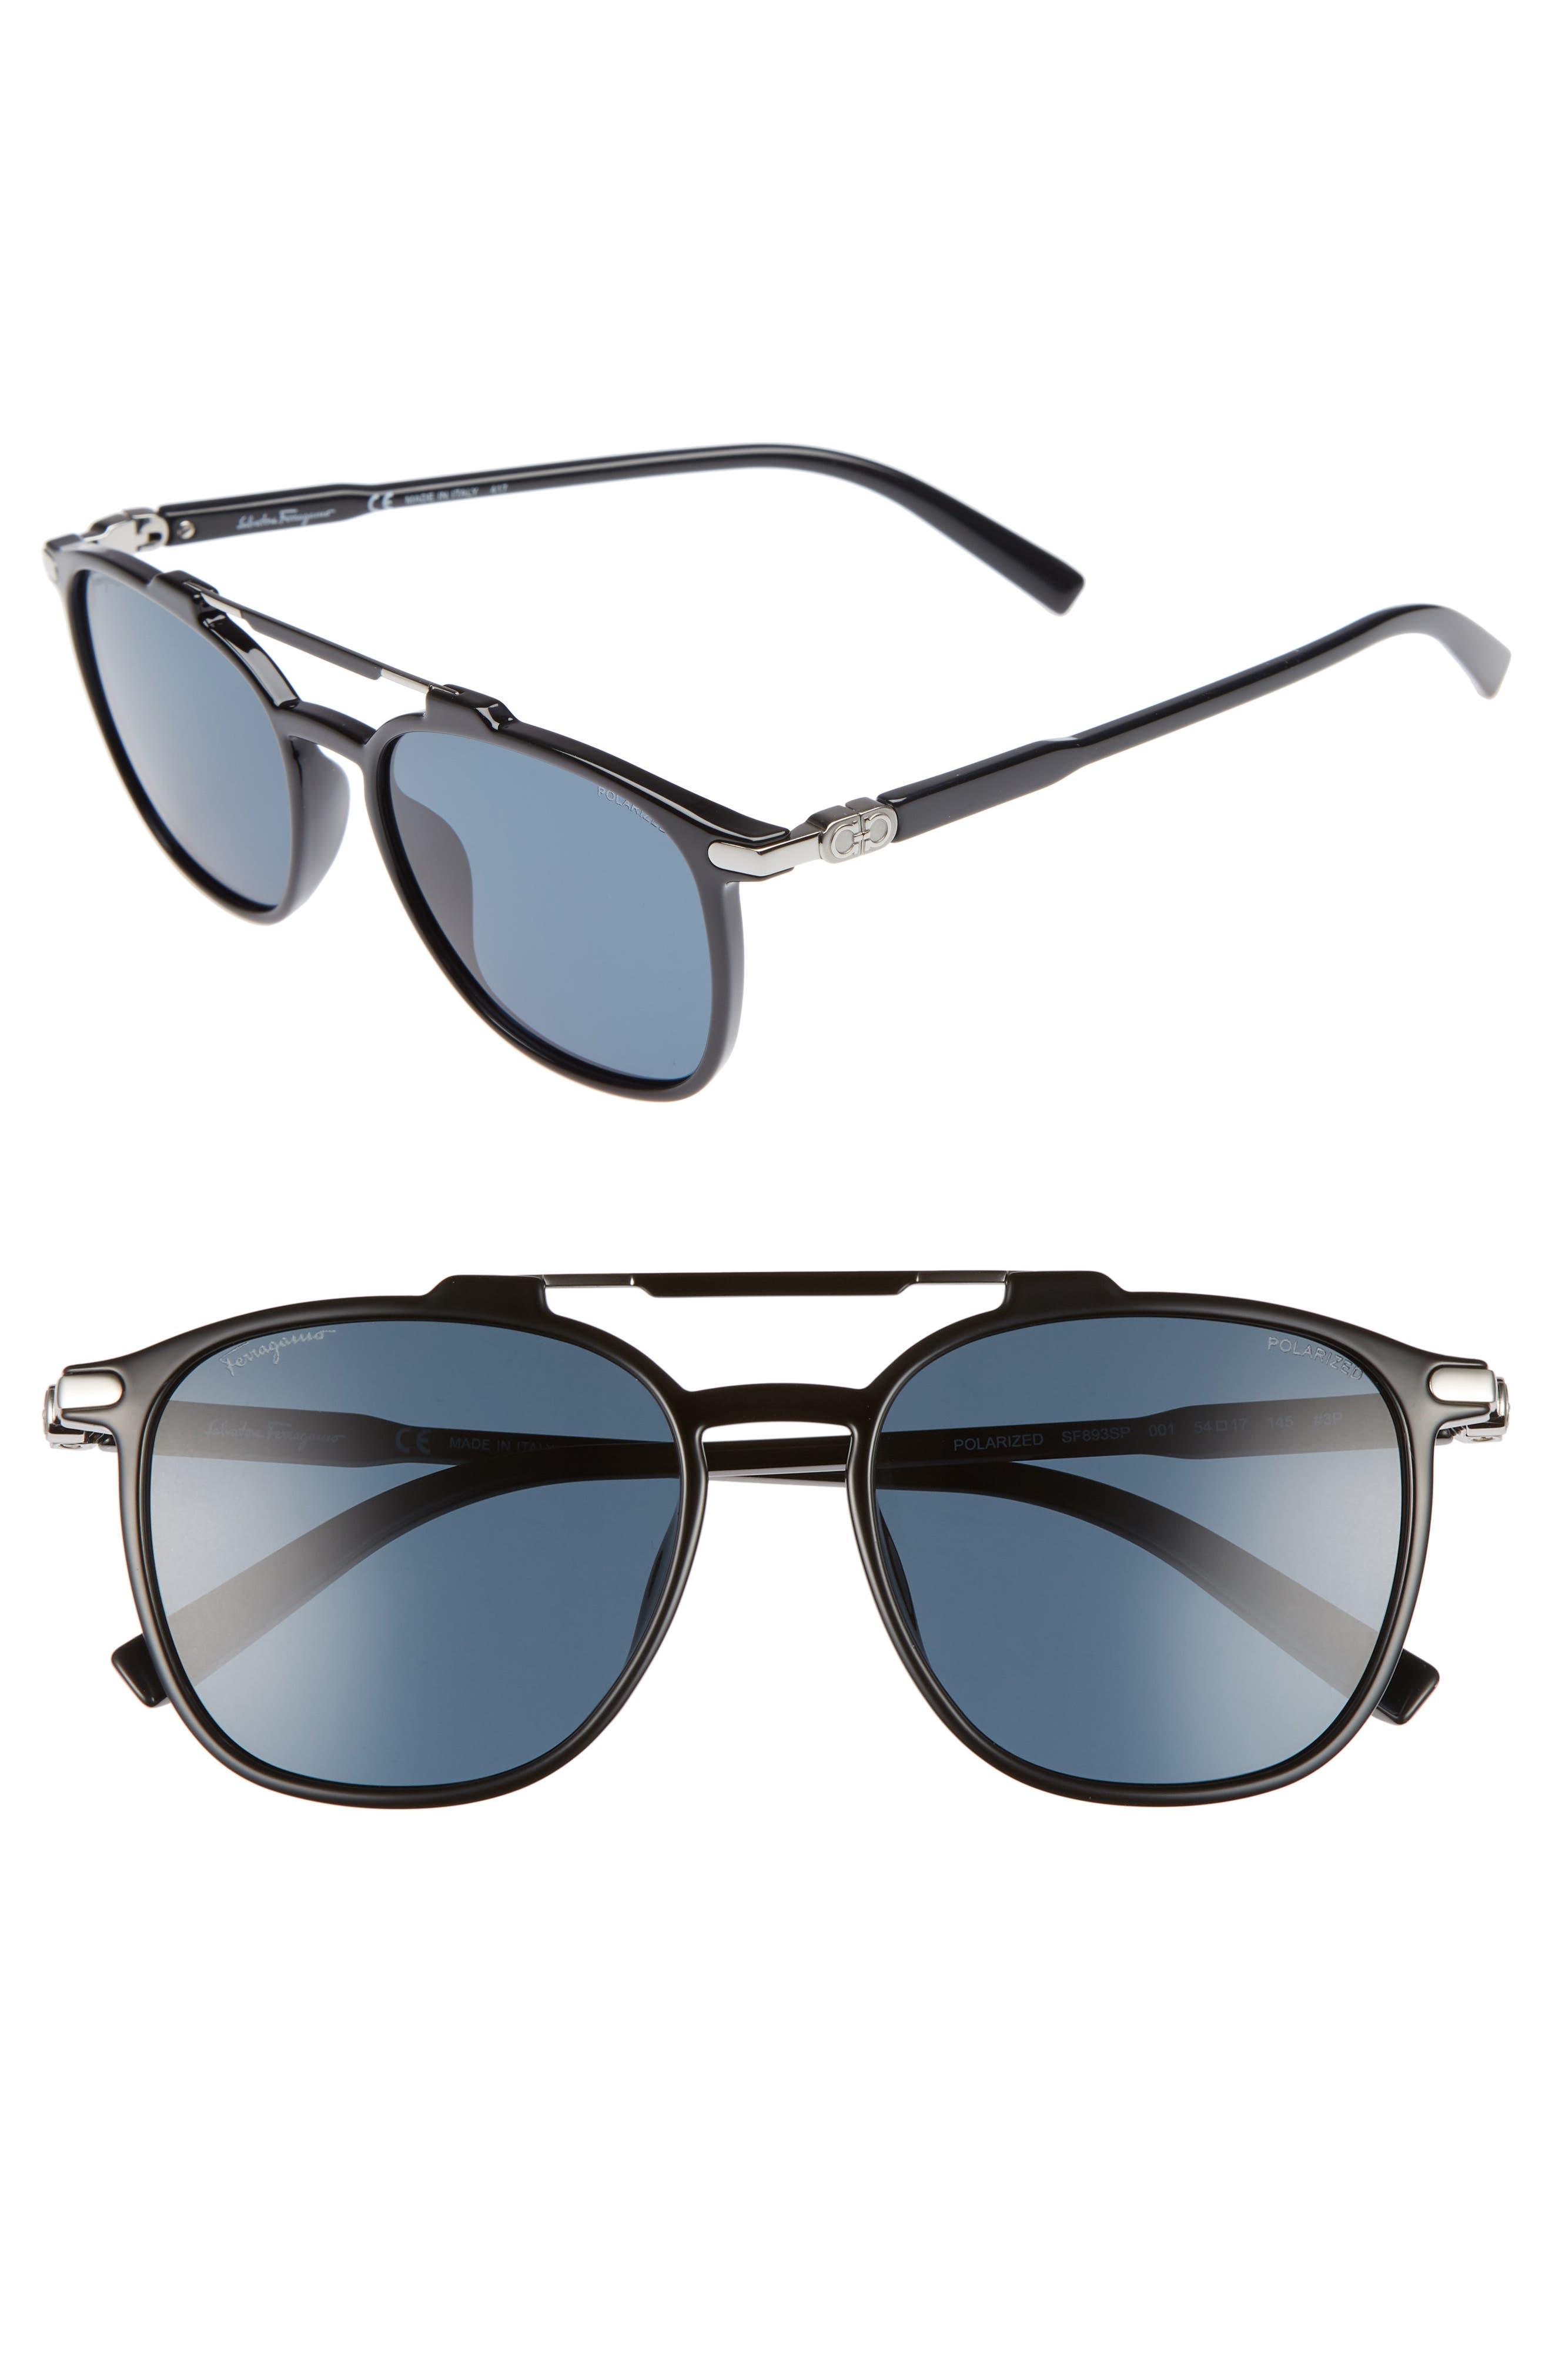 Double Gancio 54mm Polarized Sunglasses,                         Main,                         color, BLACK